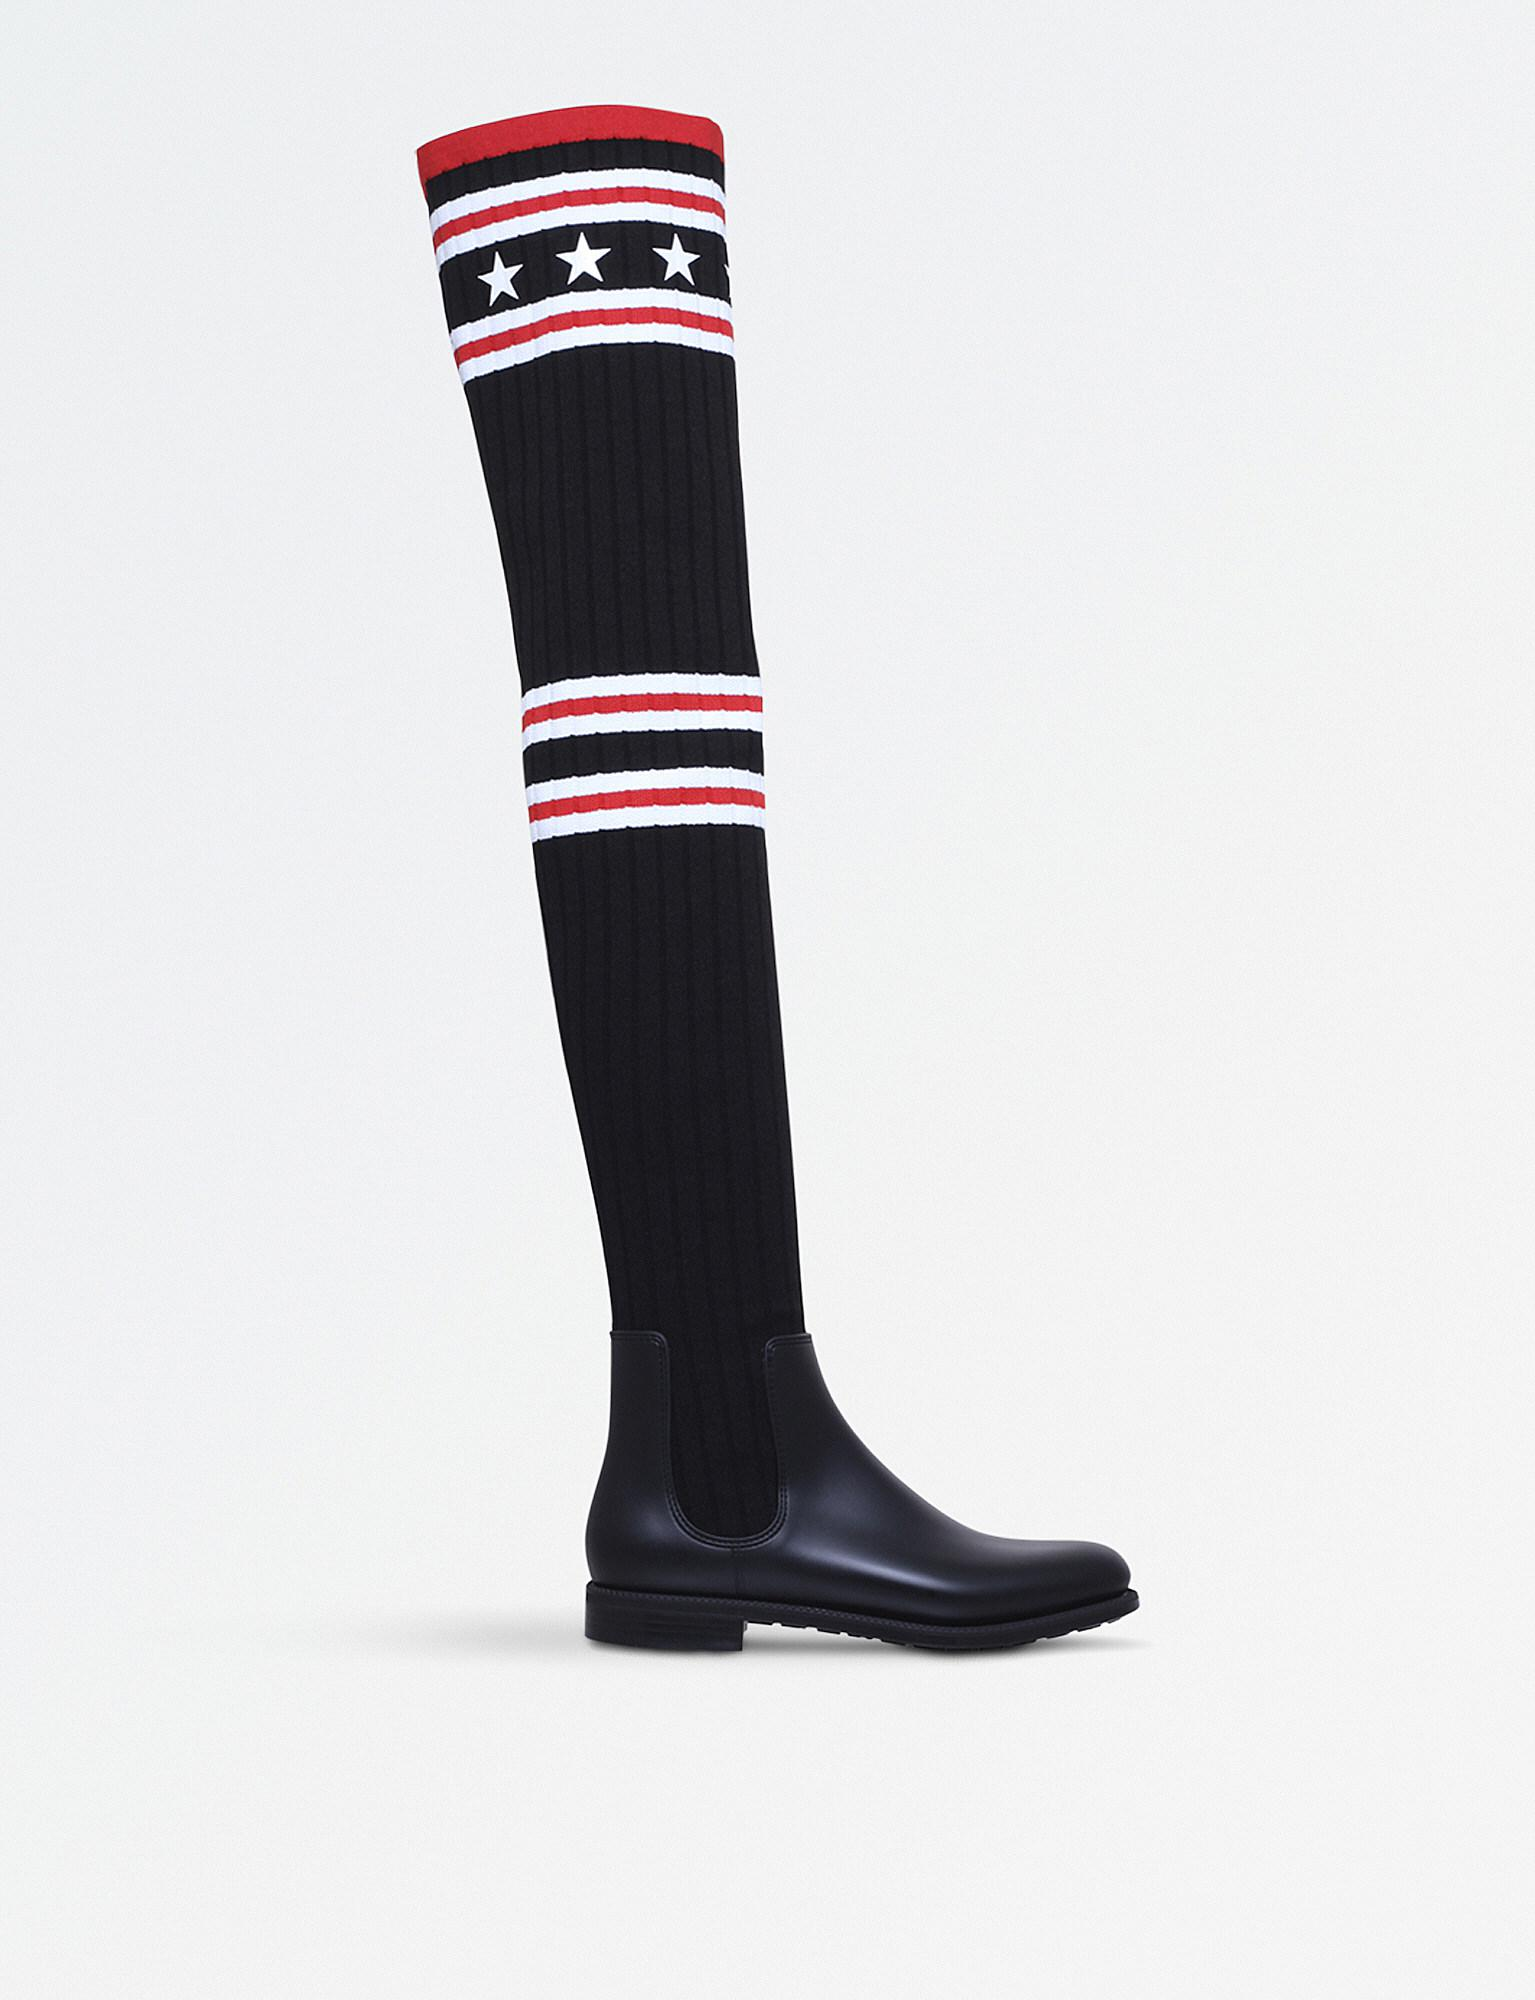 Givenchy Storm Knit Rain Boots